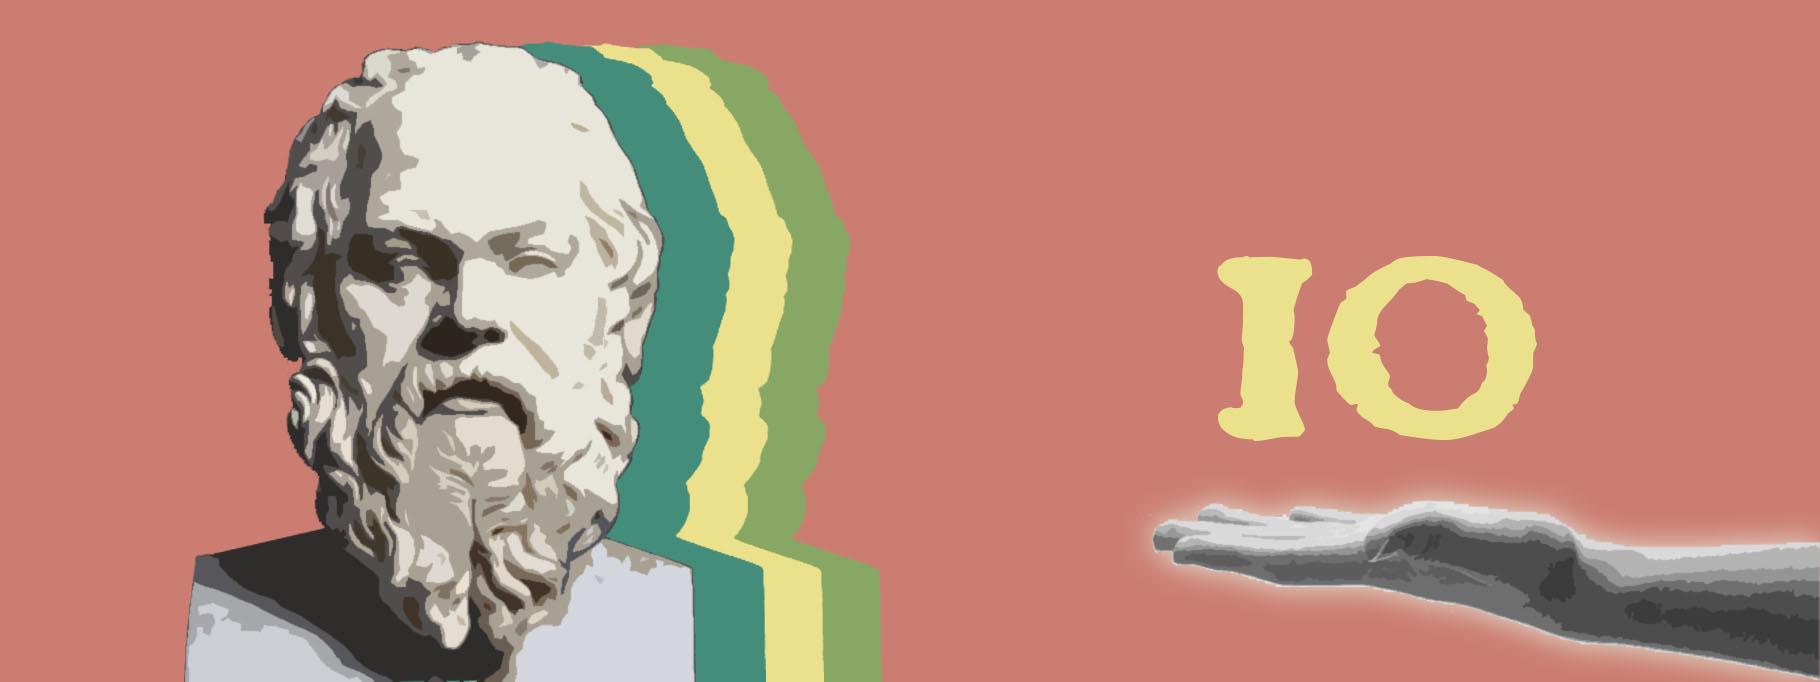 philosophe grec